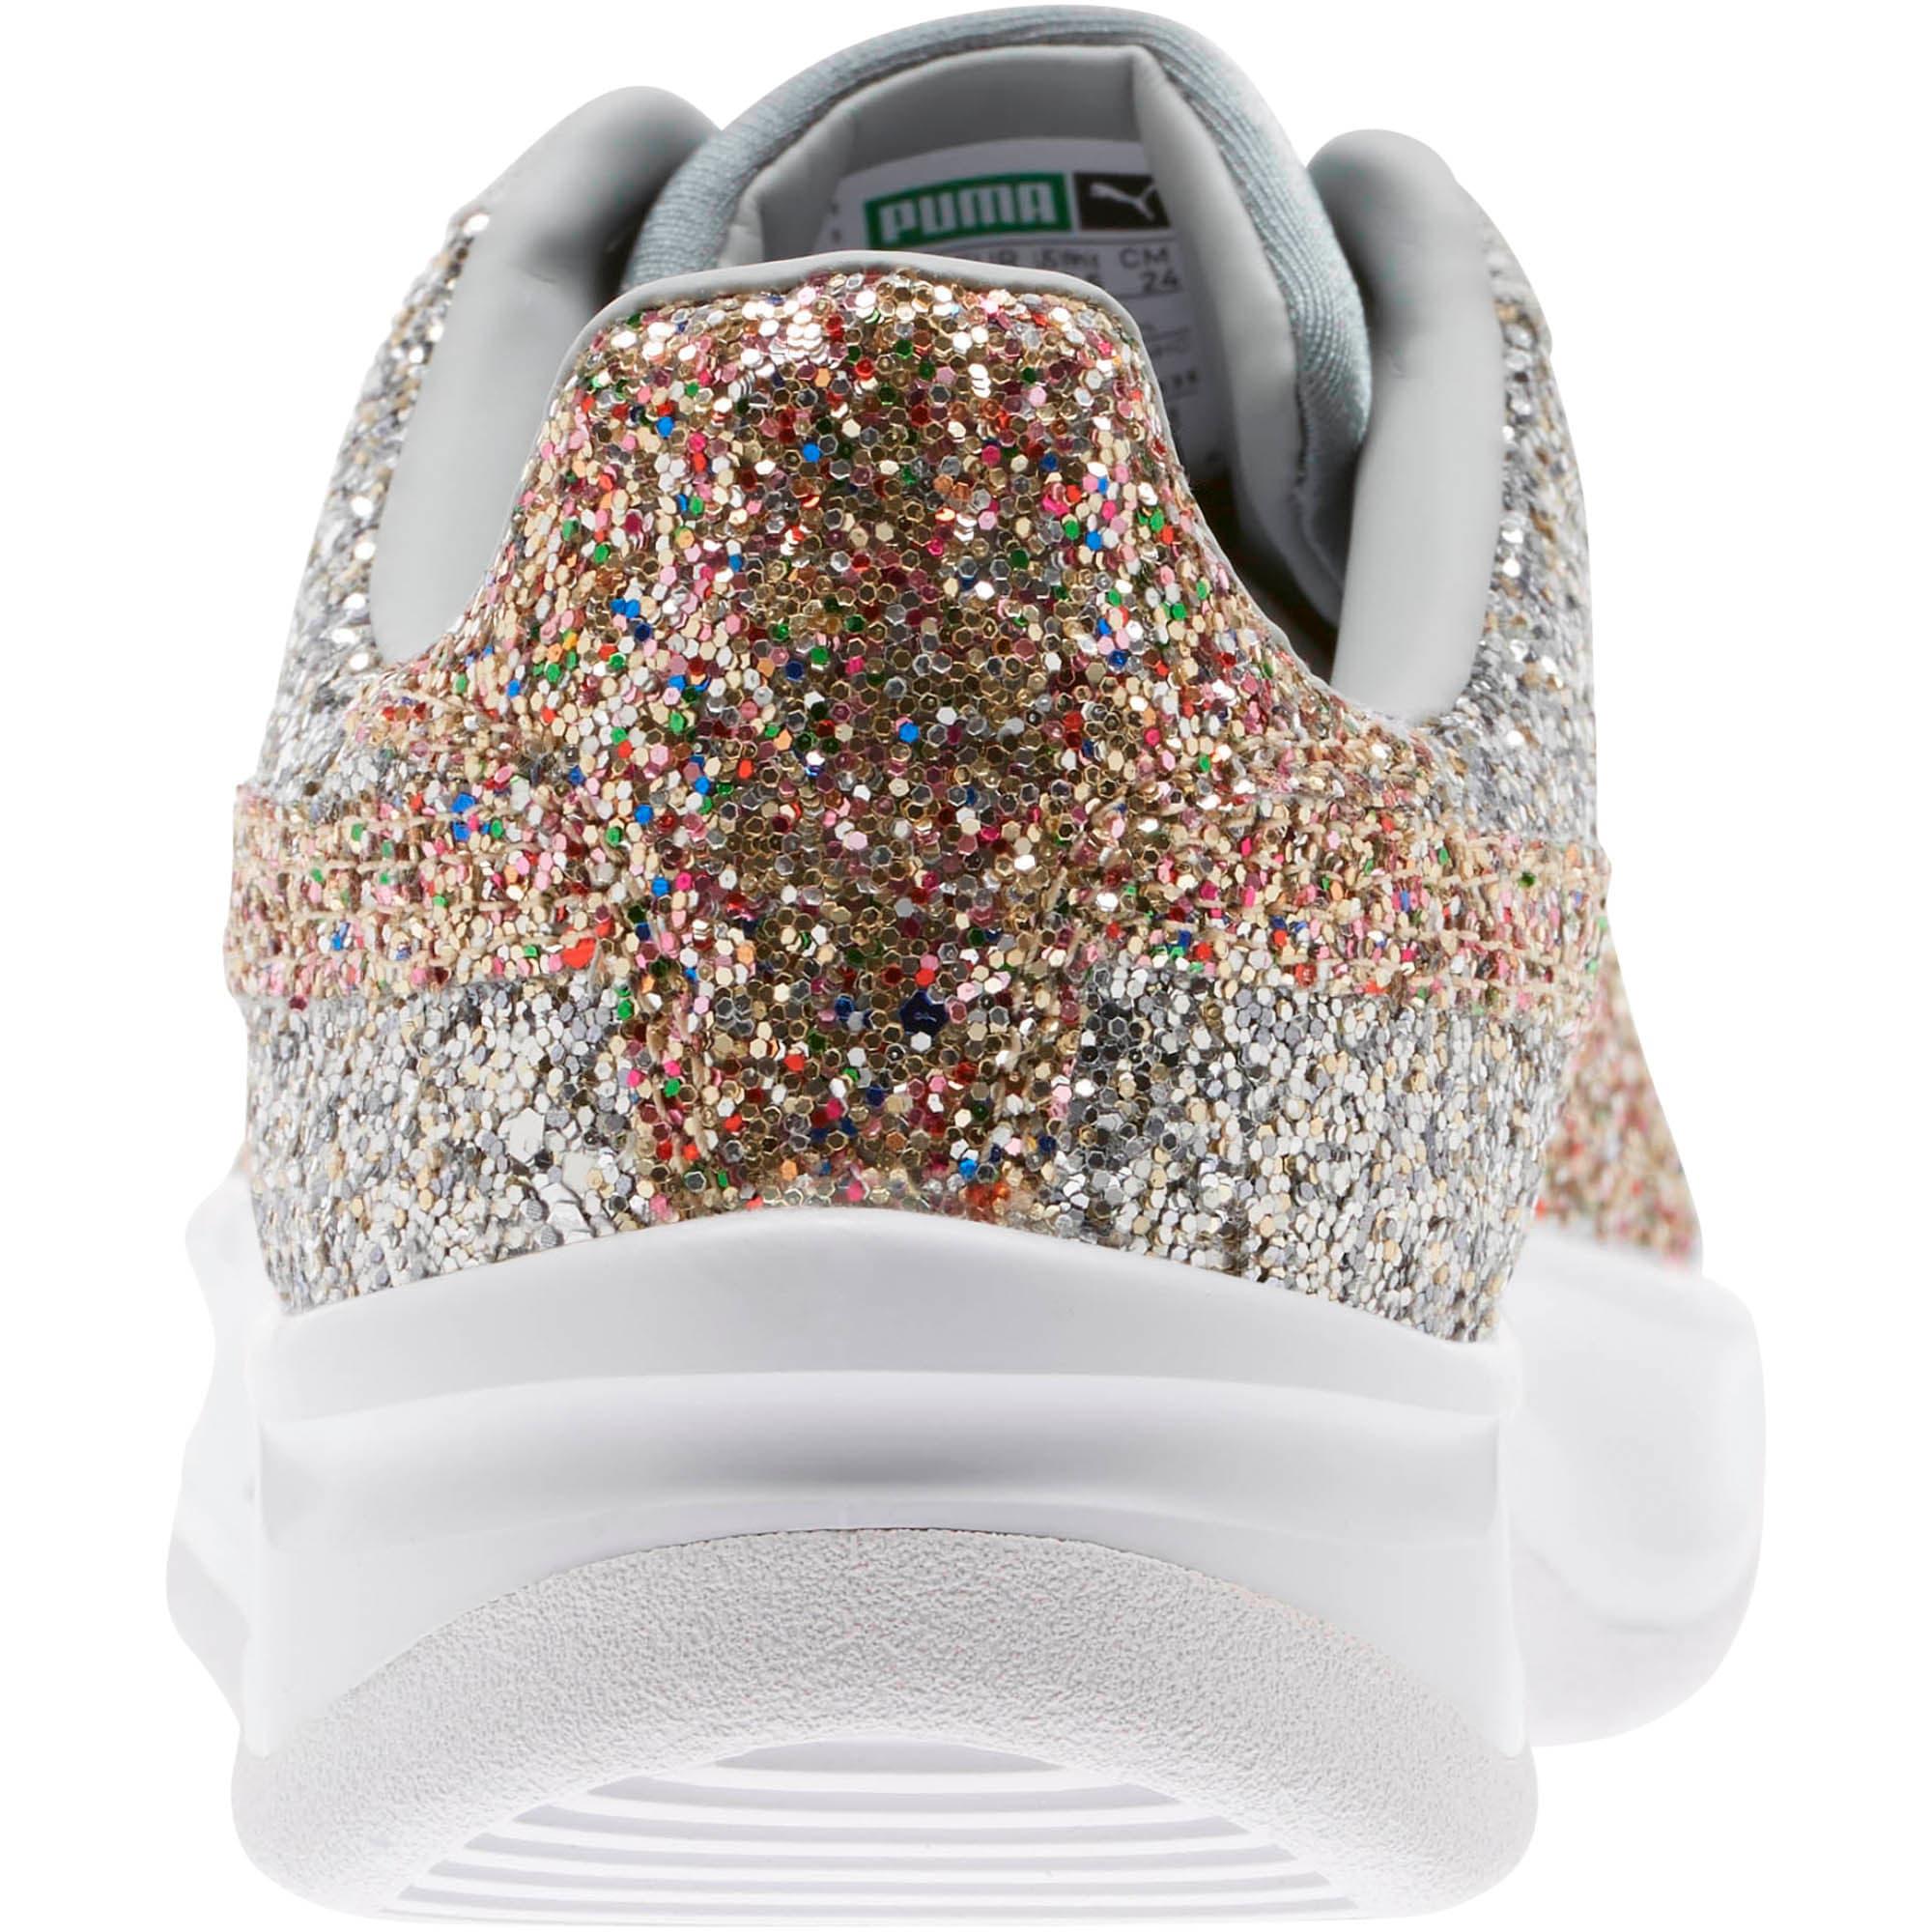 Thumbnail 4 of California Glitz Women's Sneakers, Silver-CERULEAN-Quarry, medium